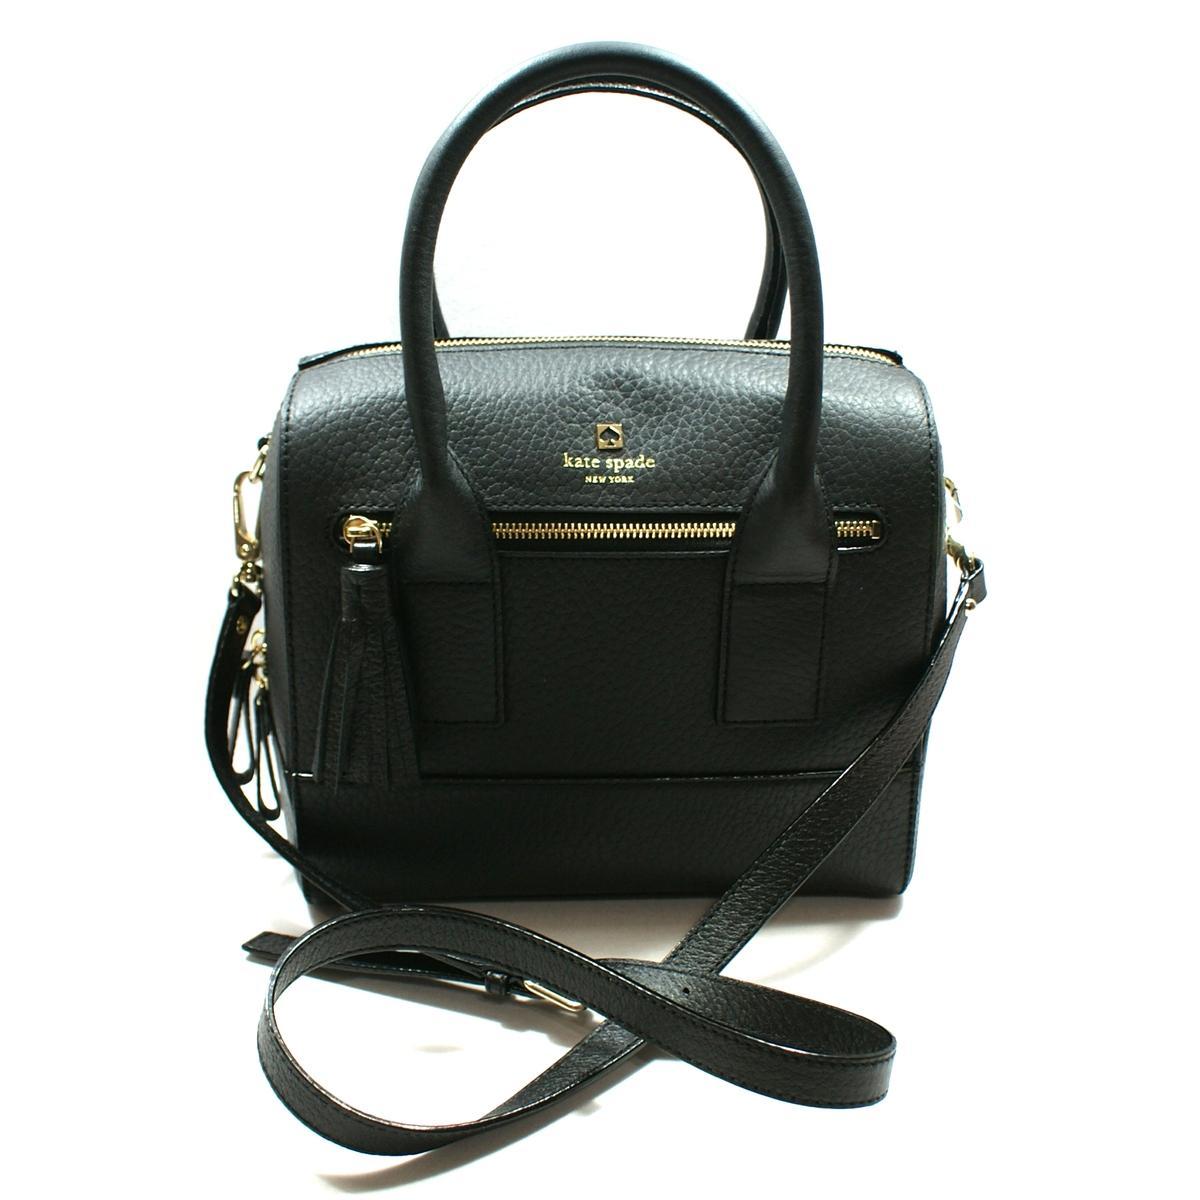 Kate Spade Alessa Southport Avenue Black Satchel Handbag